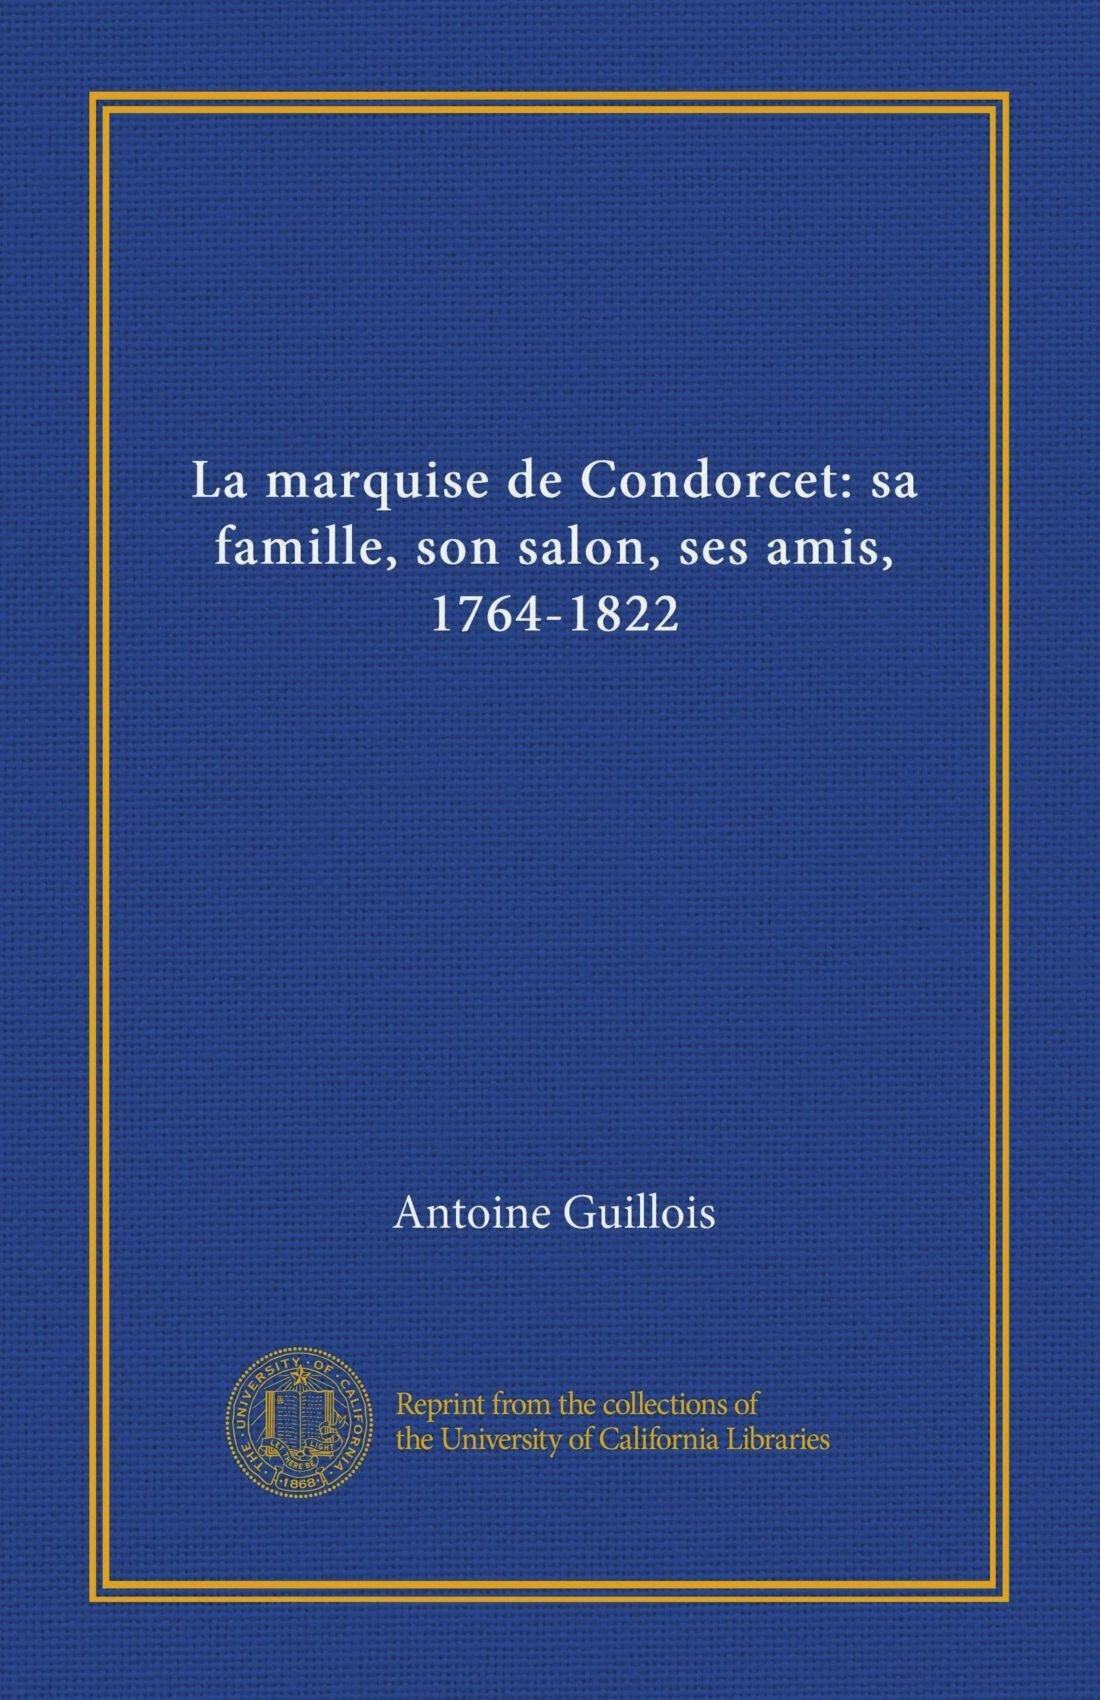 La marquise de Condorcet: sa famille, son salon, ses amis, 1764-1822 (Vol-1) (French Edition) pdf